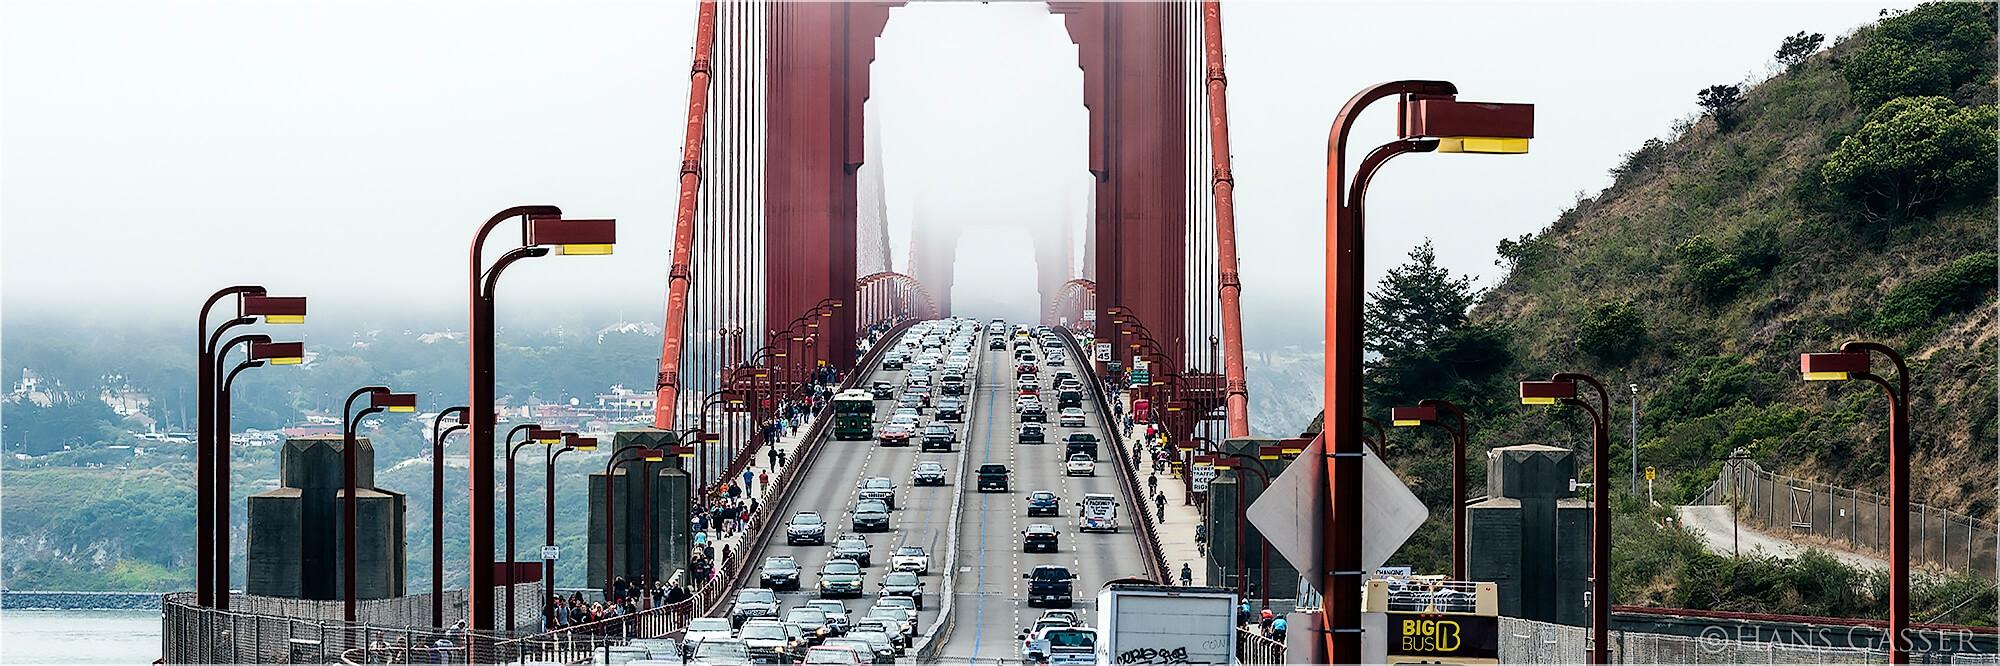 Panoramabild Traffic Golden Gate Bridge San Francisco